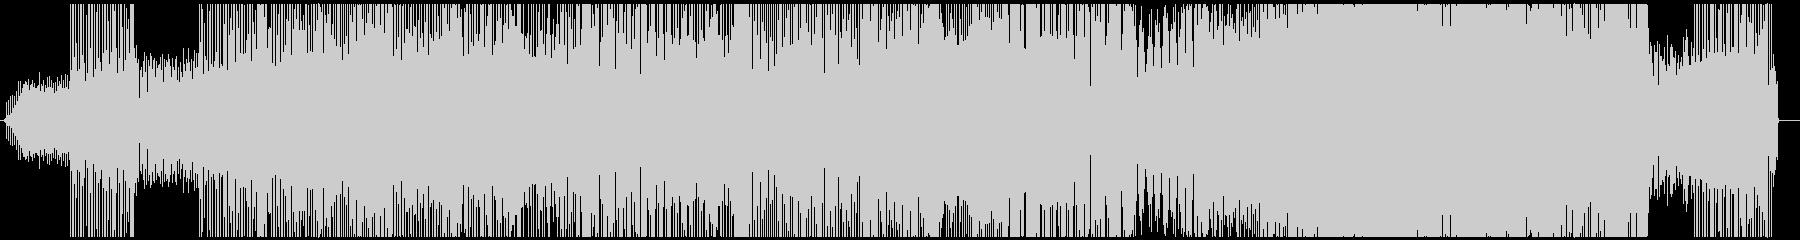 DUSKの未再生の波形